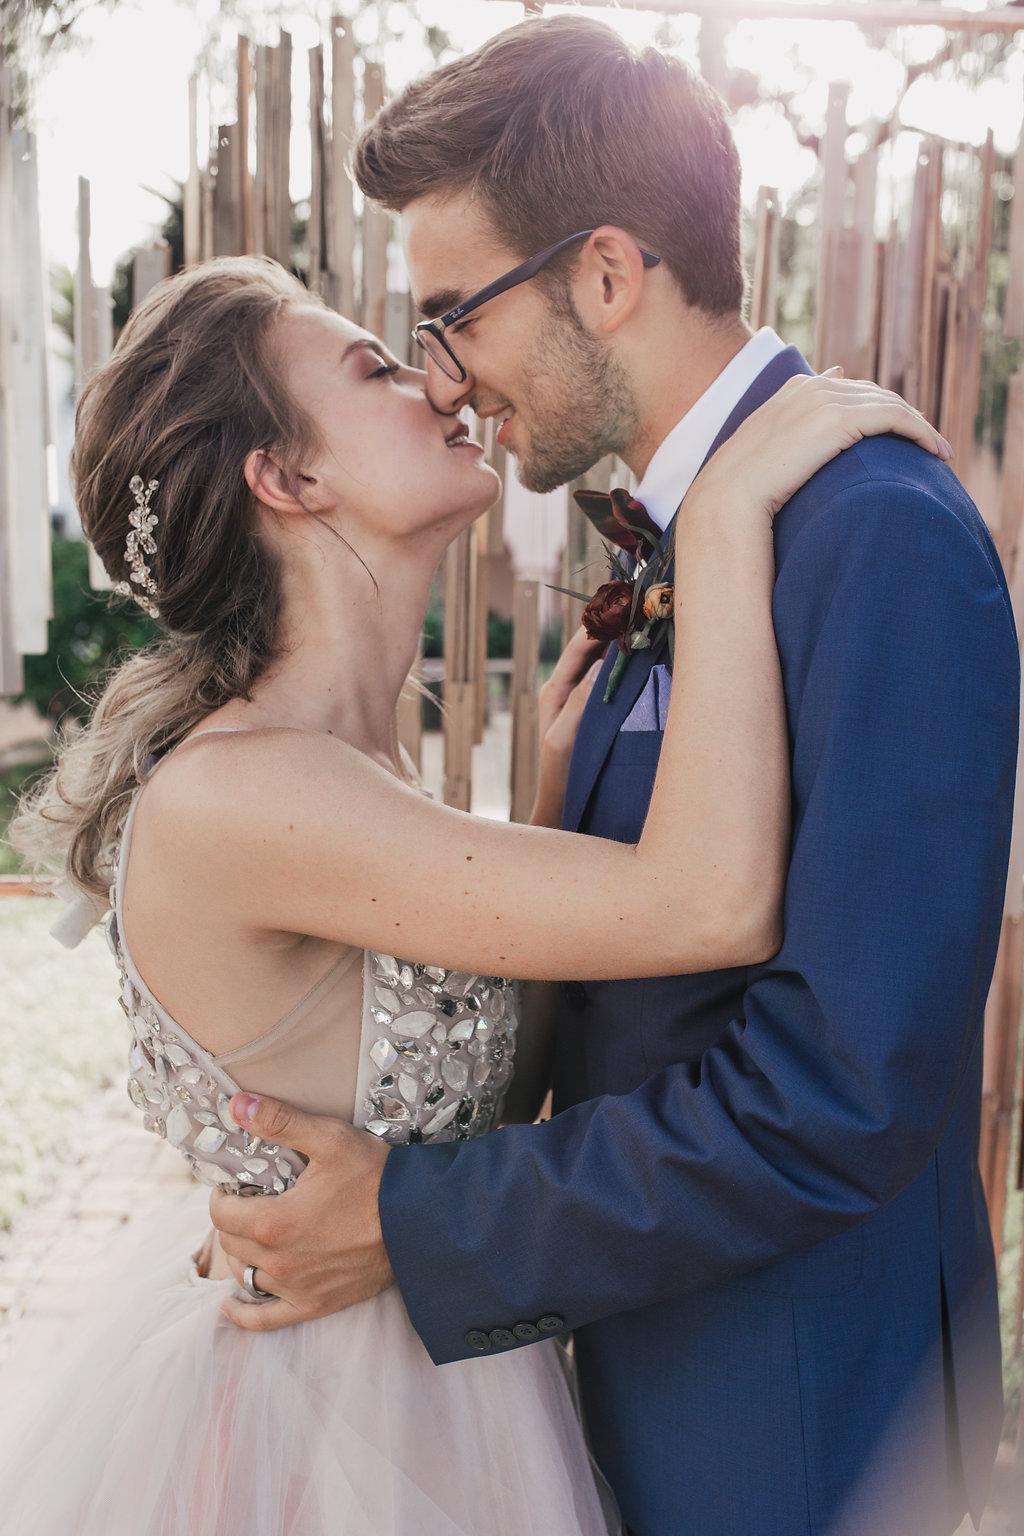 romantic wedding photography - photo by Alondra Vega Photography http://ruffledblog.com/jewel-toned-wedding-ideas-with-a-surprise-proposal